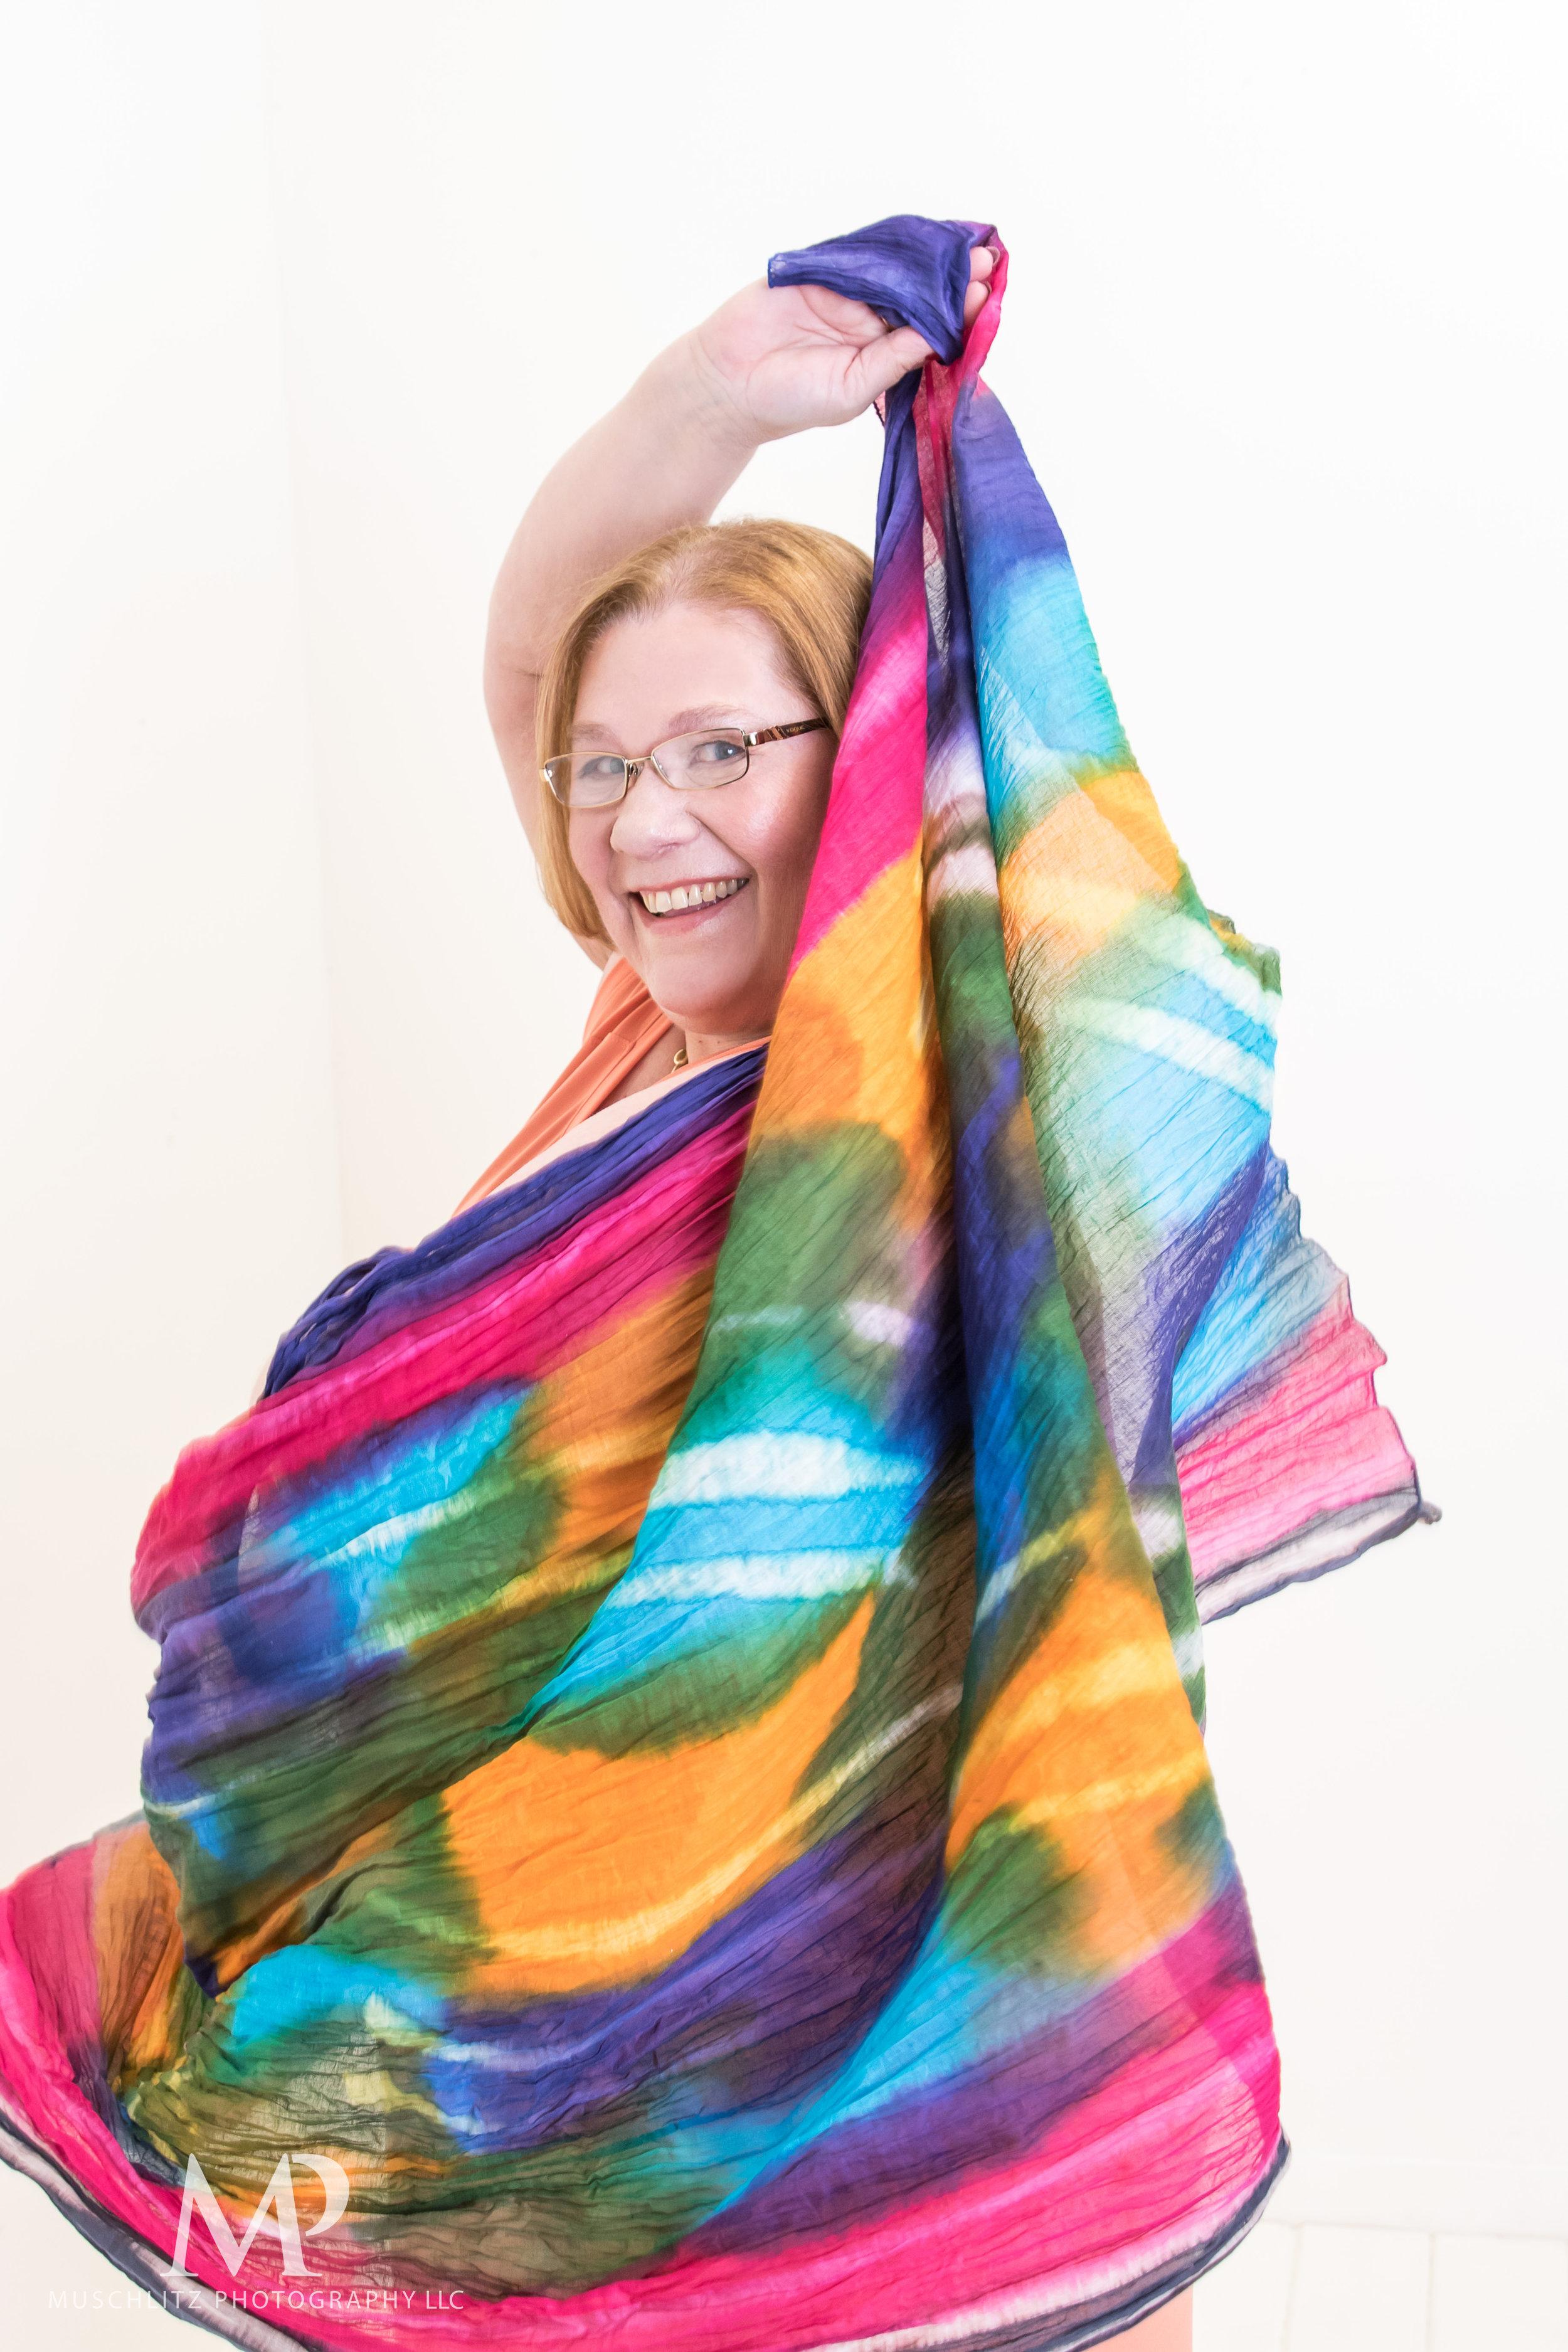 beauty-glamour-65-birthday-portrait-session-portraits-columbus-ohio-muschlitz-photography-033.JPG